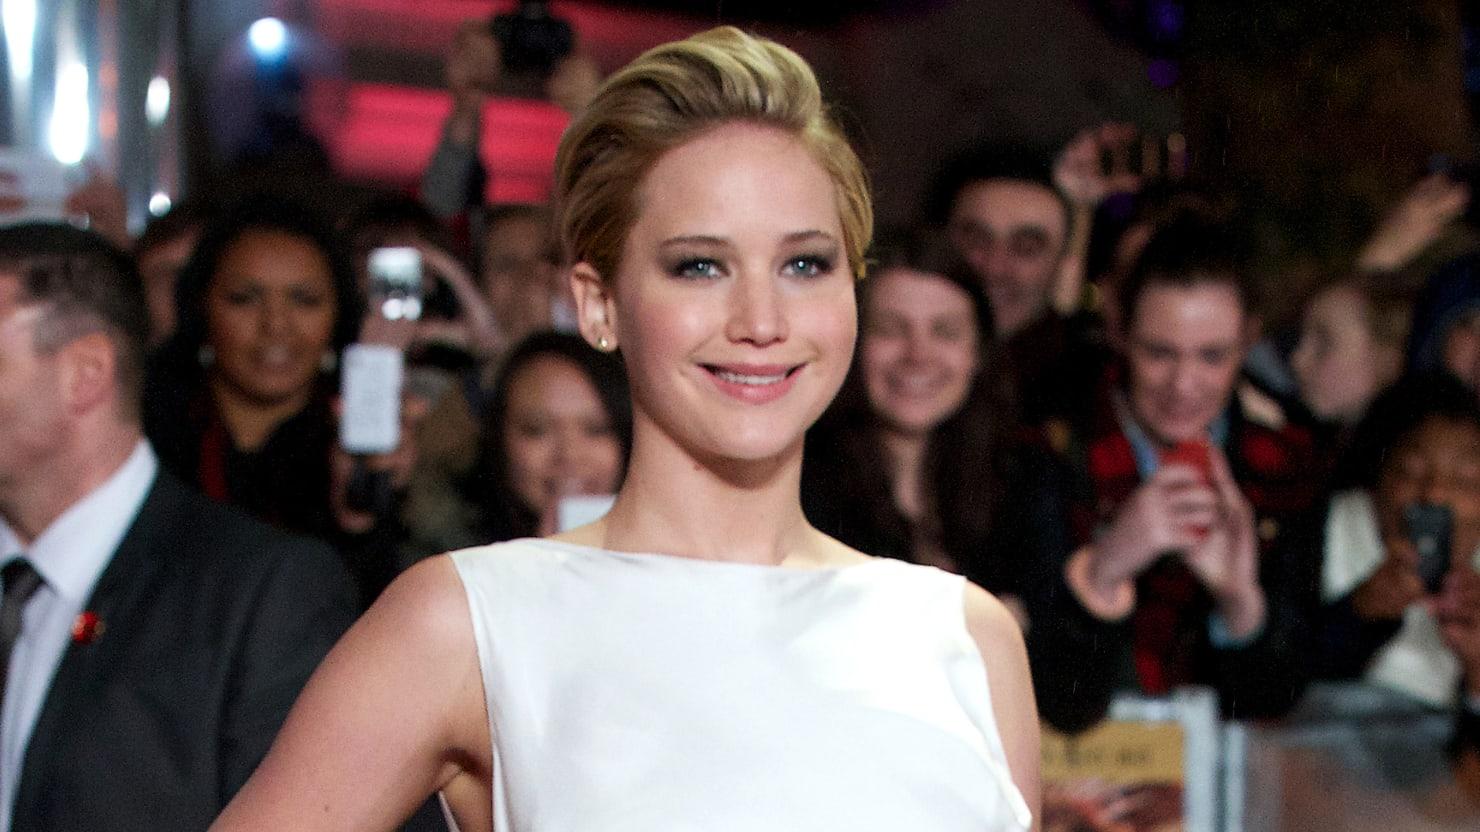 Watch Jennifer Lawrence Tell A Hilarious Story About Butt Plugs On